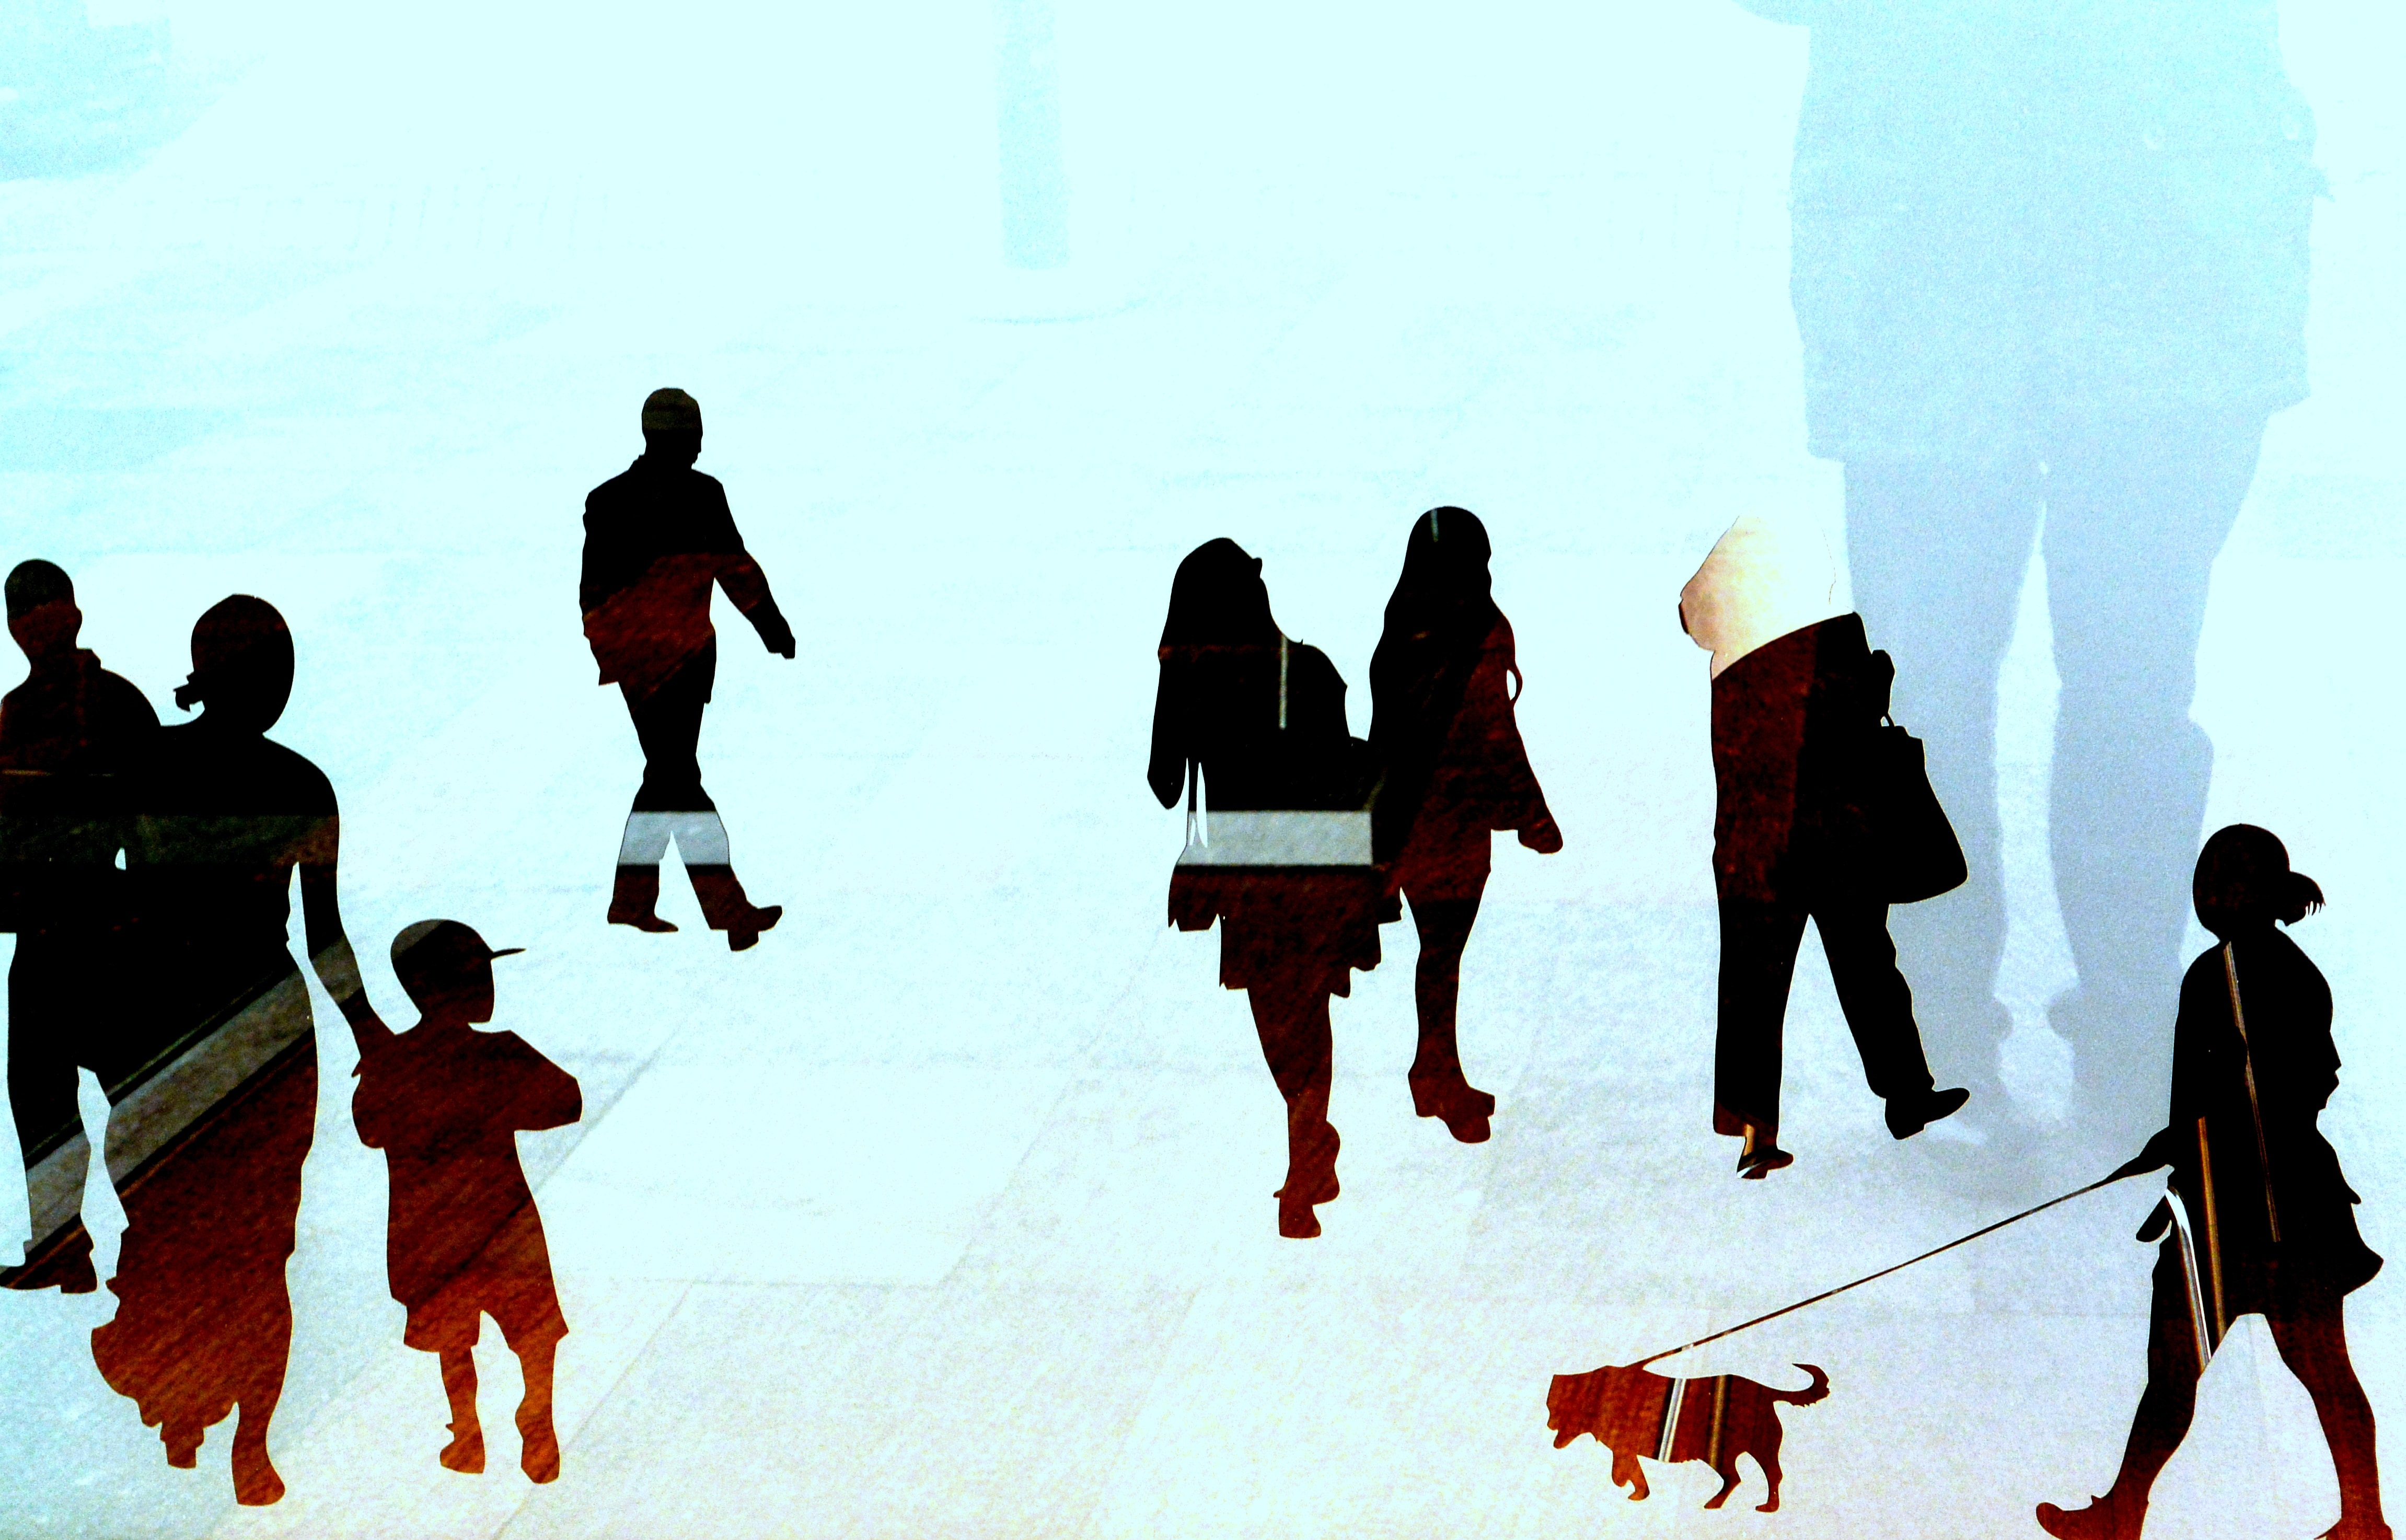 4604x2947 People Walking Graphics Free Image Peakpx